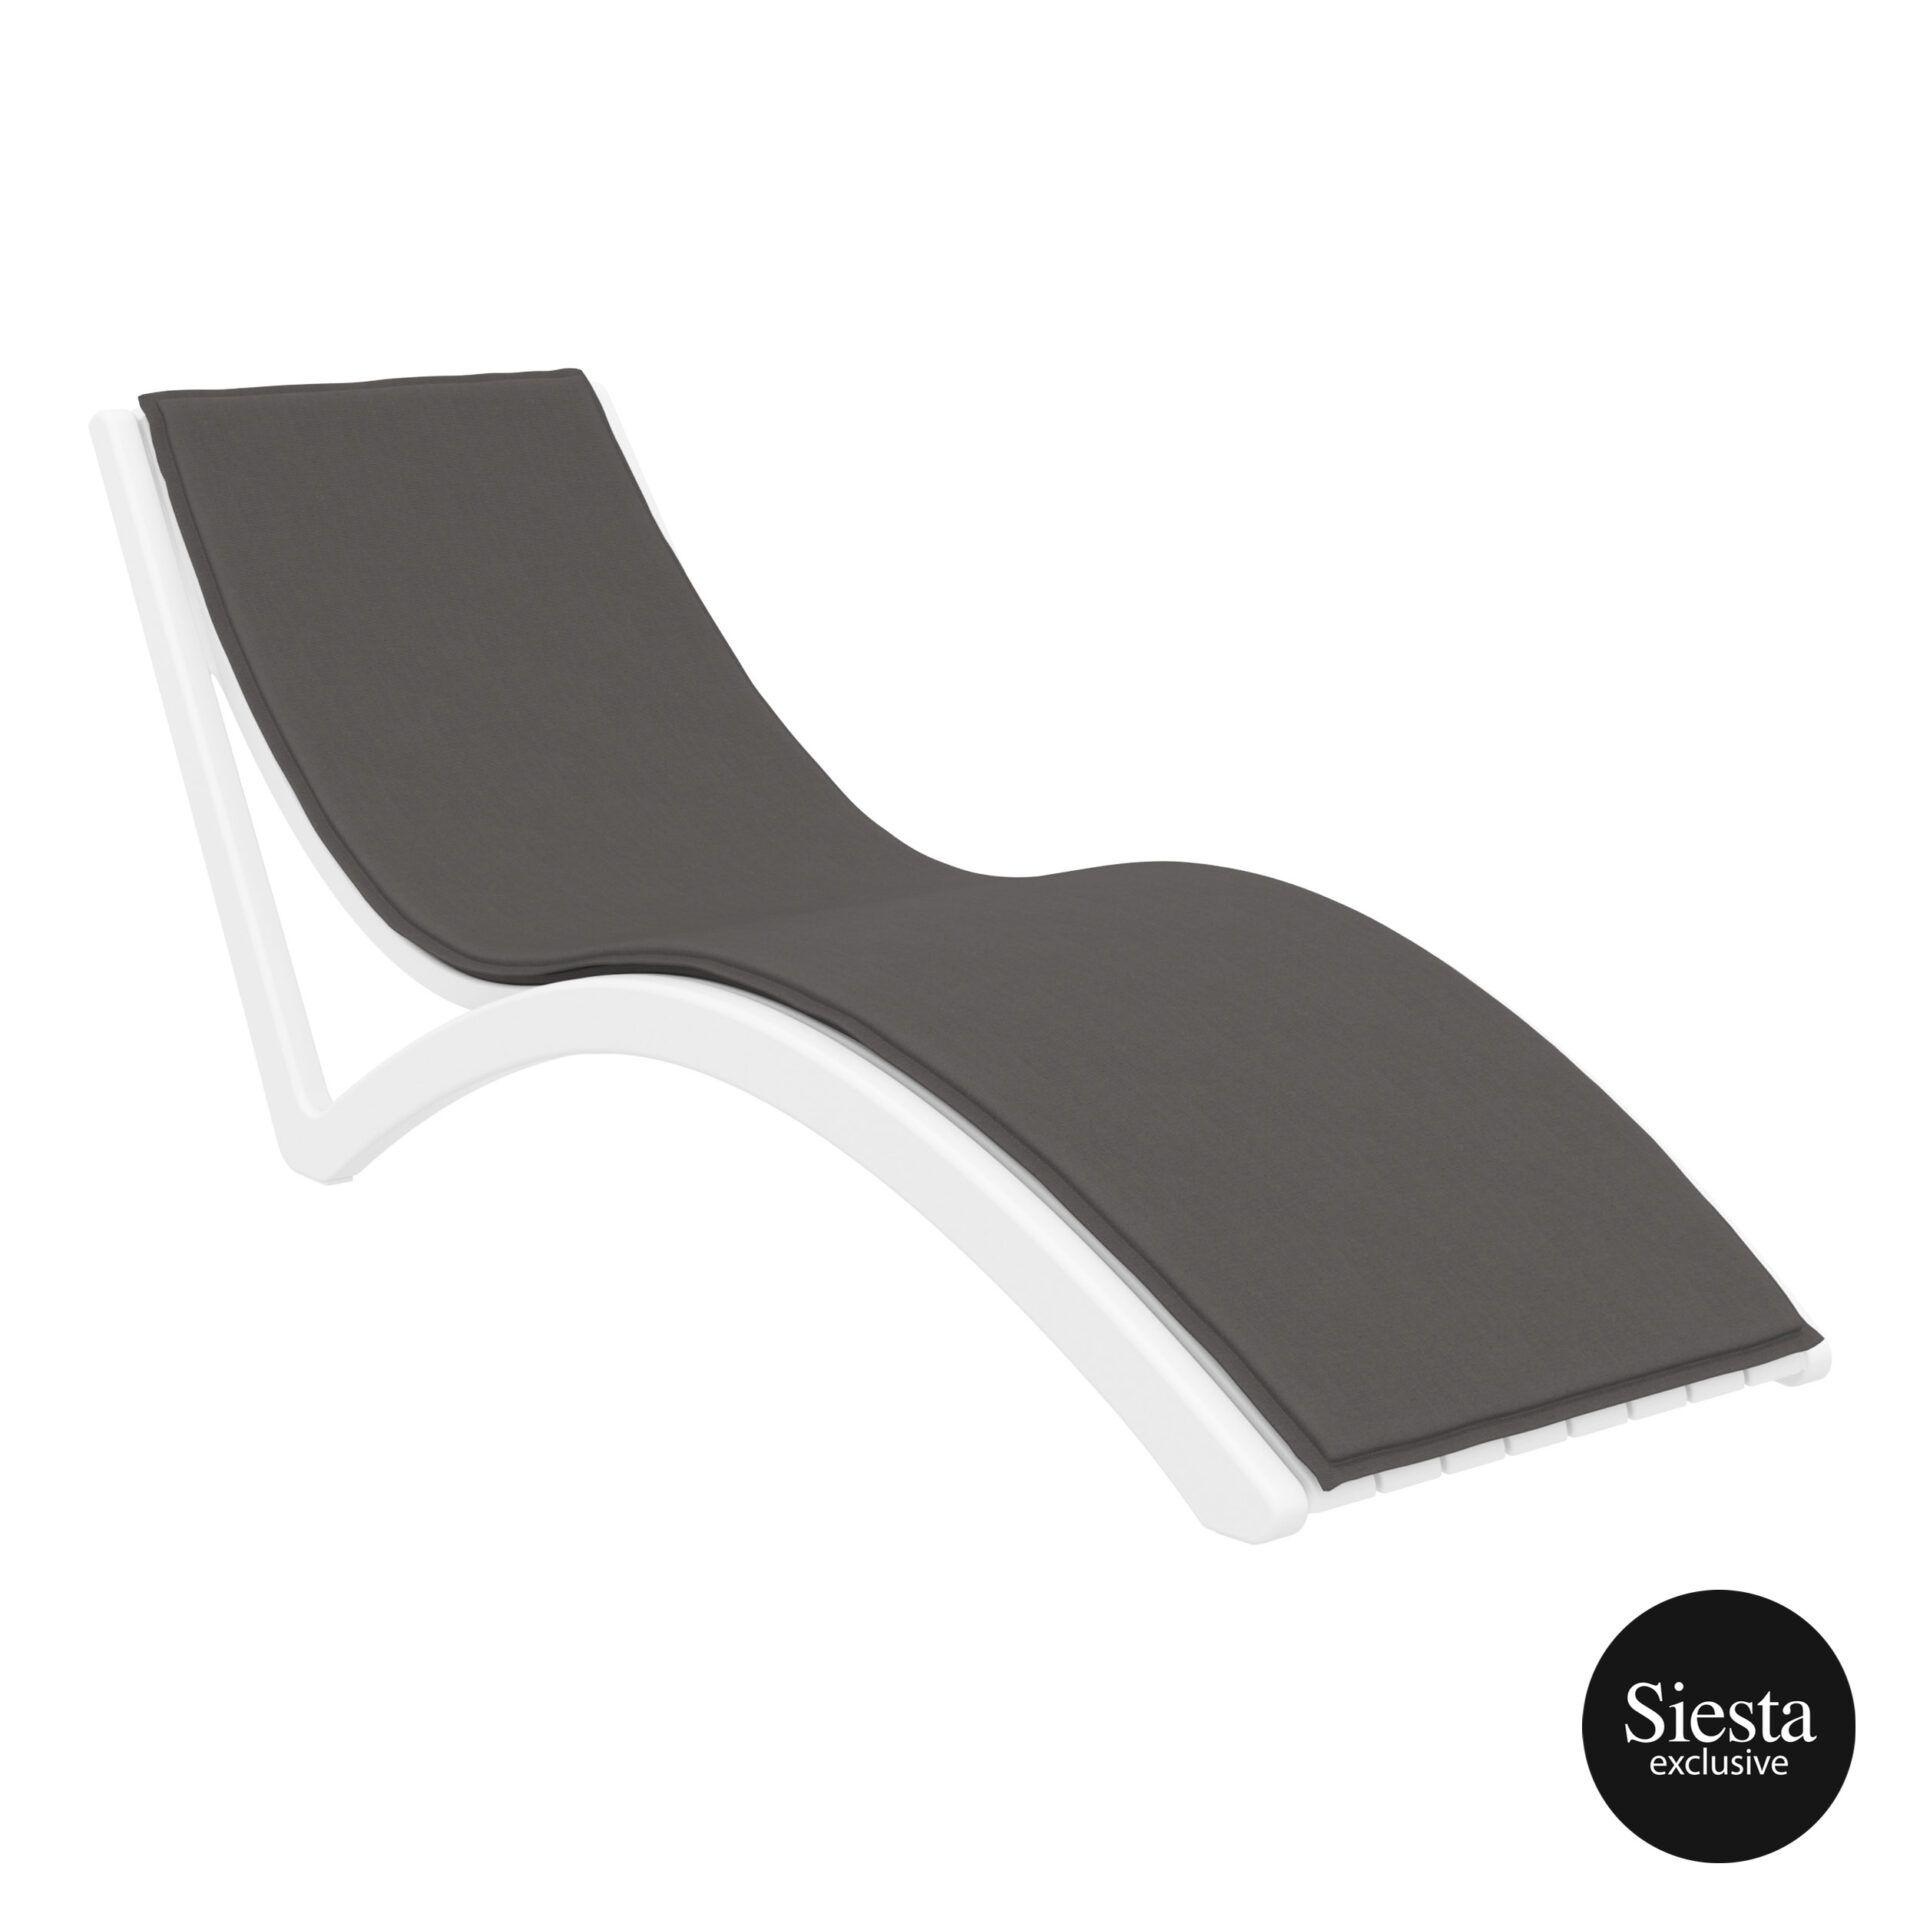 outdoor polypropylene slim sunlounger cushion white darkgrey front side